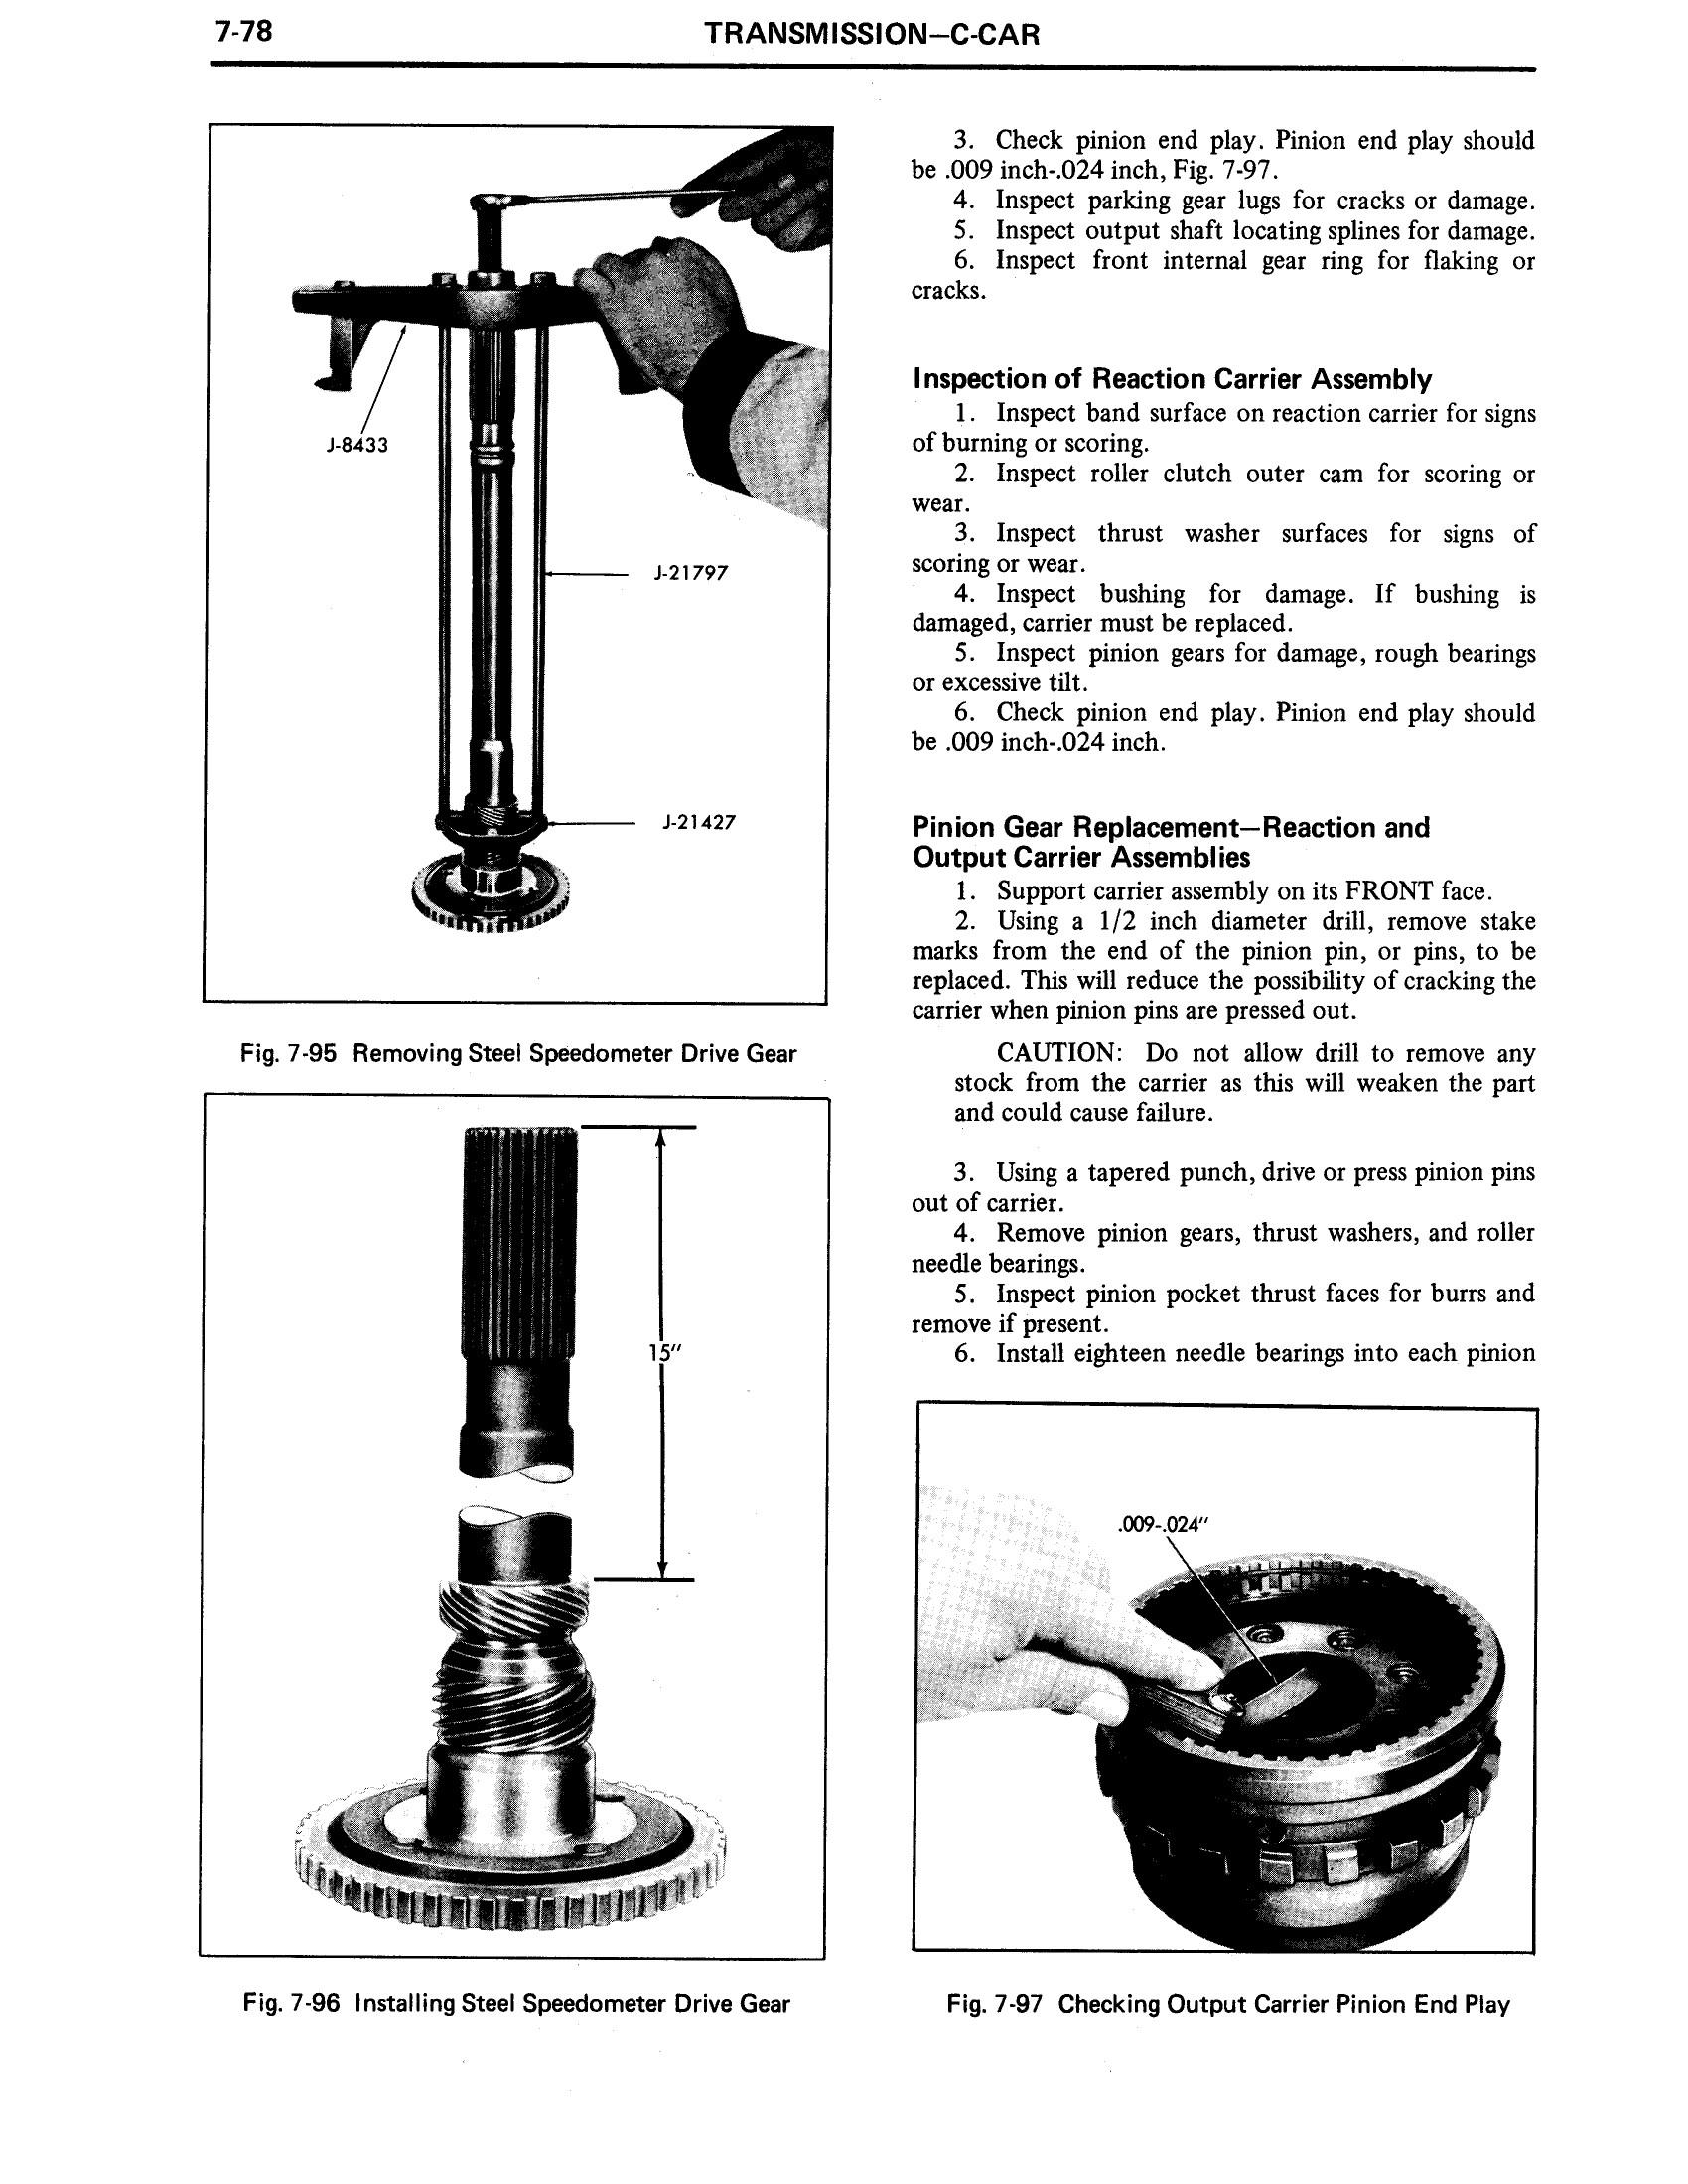 1971 Cadillac Shop Manual- Transmission Page 78 of 156